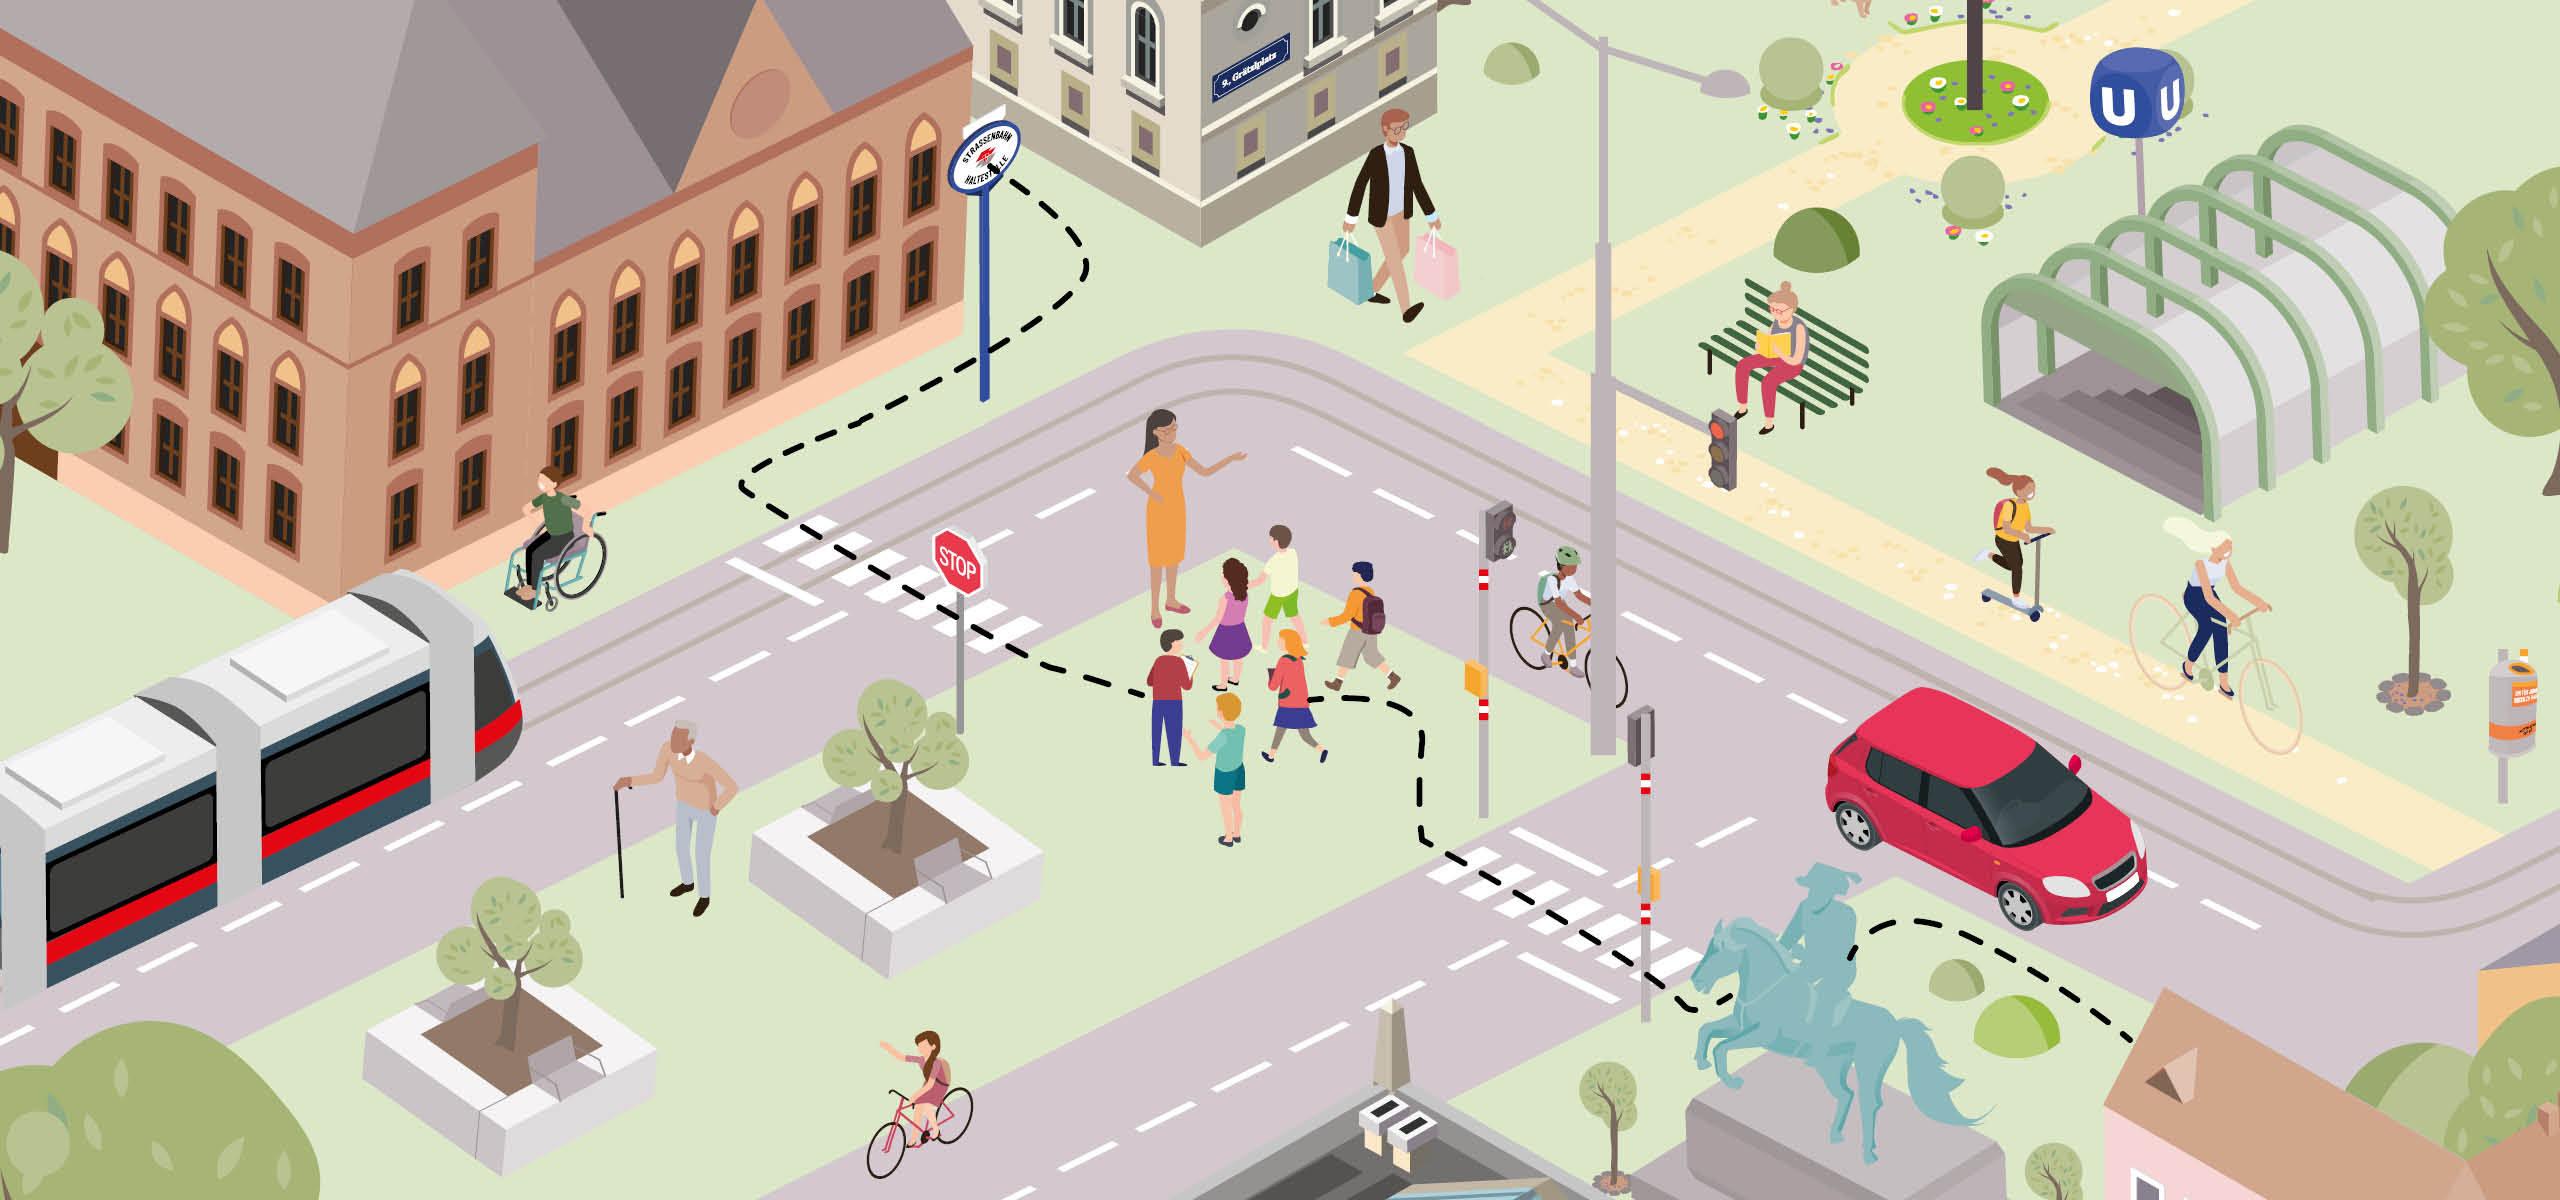 Die Grafik illustriert das praxisnahe Mobilitätsbildungsprogramm im Verkehrsraum